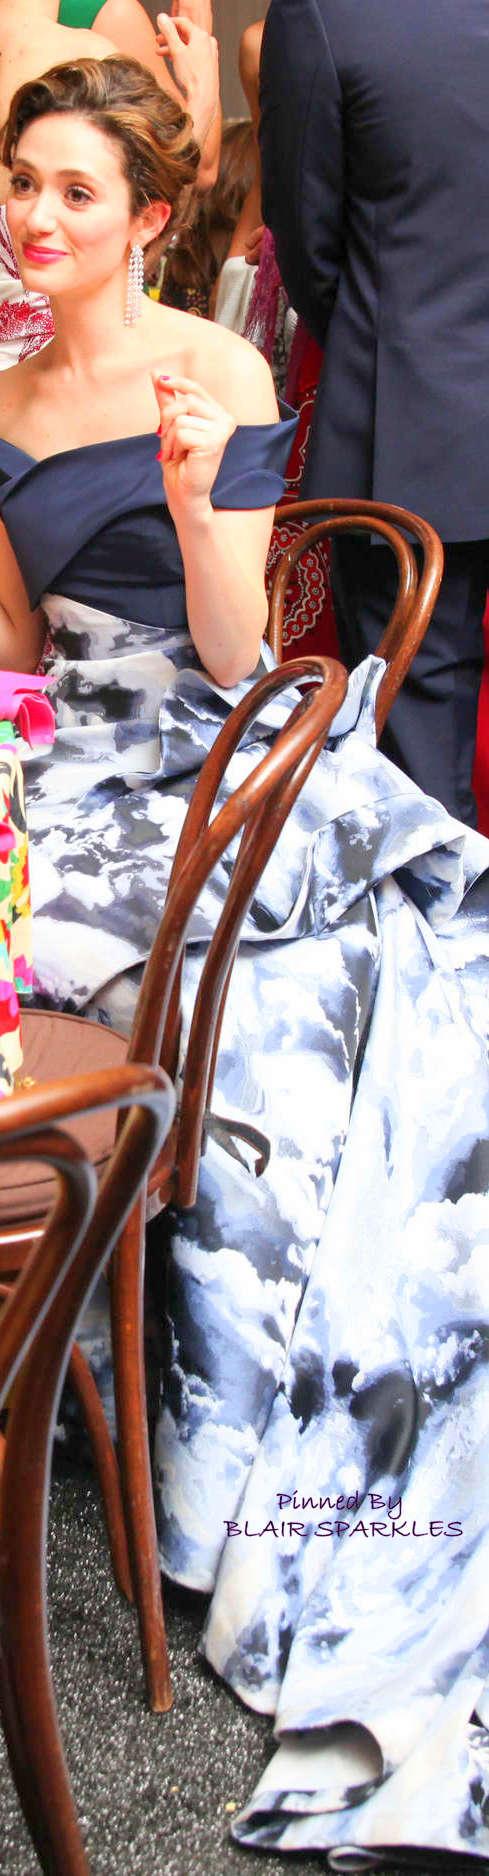 Emmy Rossum ♕♚εїз | BLAIR SPARKLES |